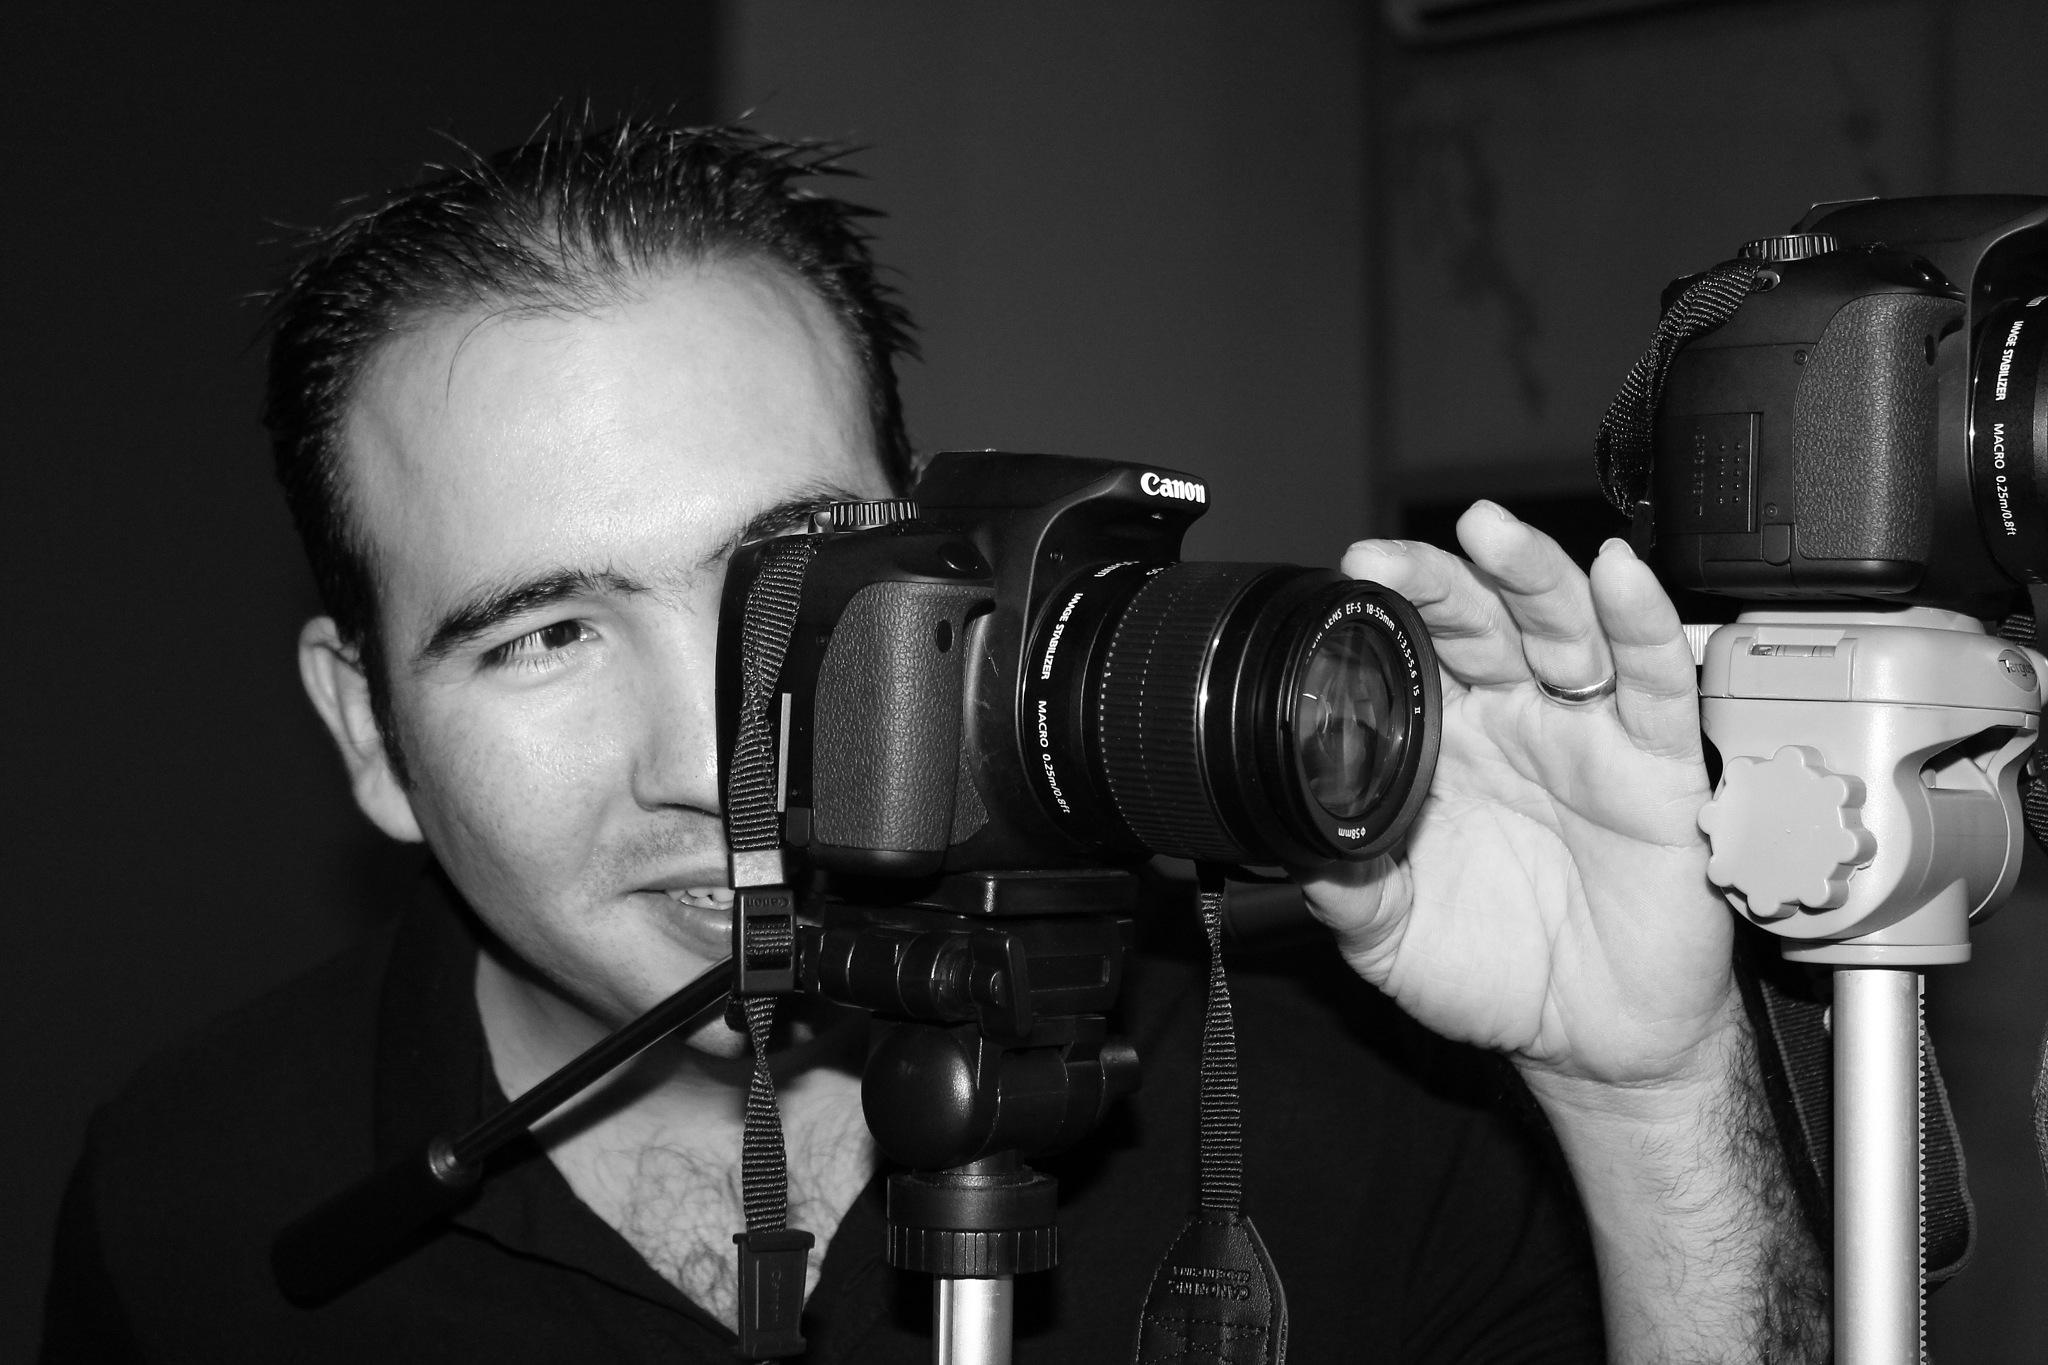 camera man by Paul Alvarez